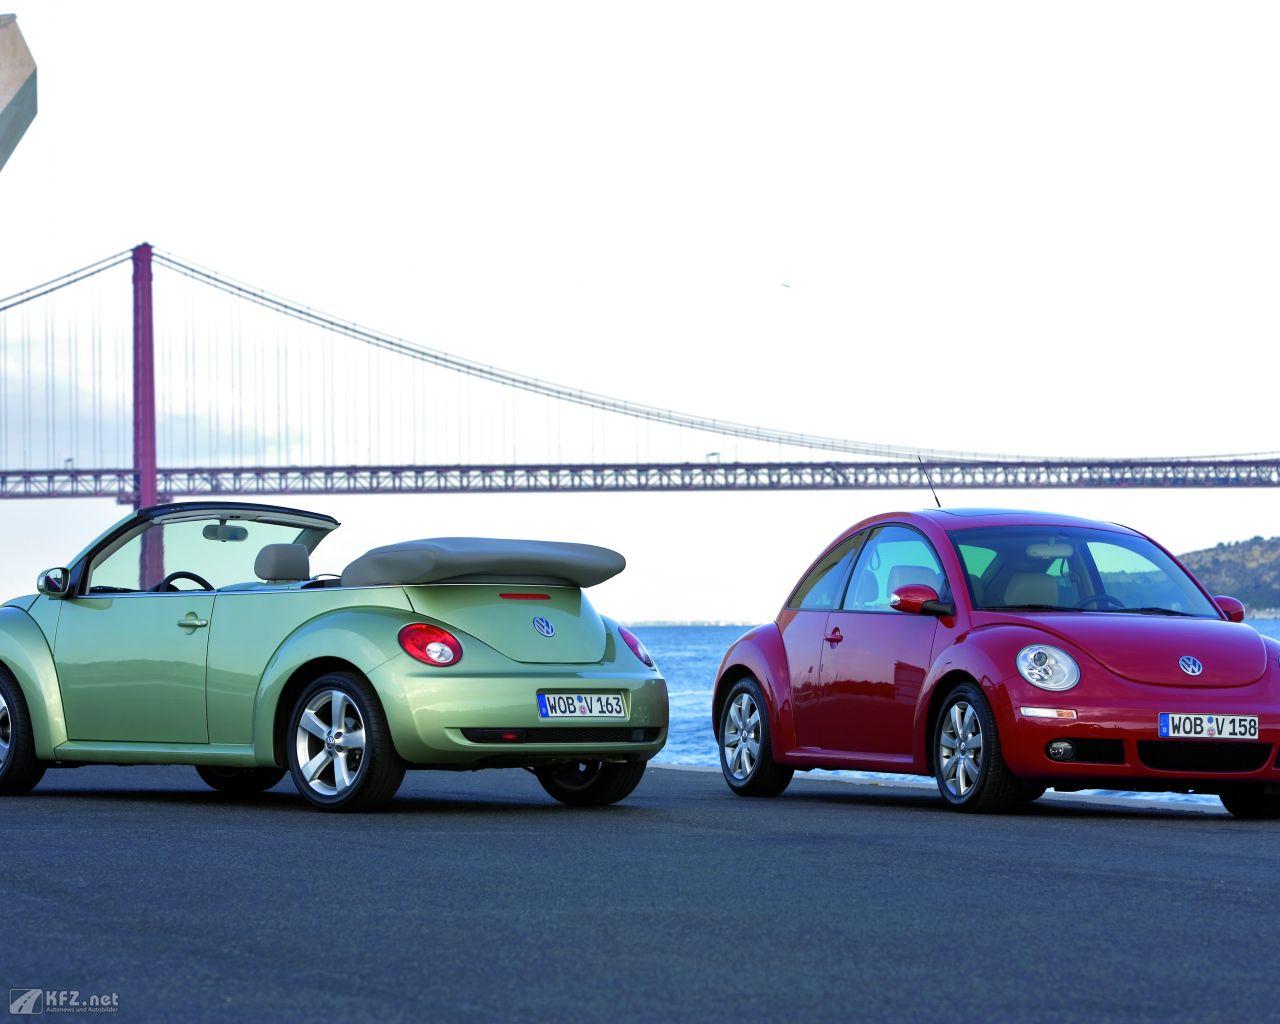 vw-beetle-1280x1024-12